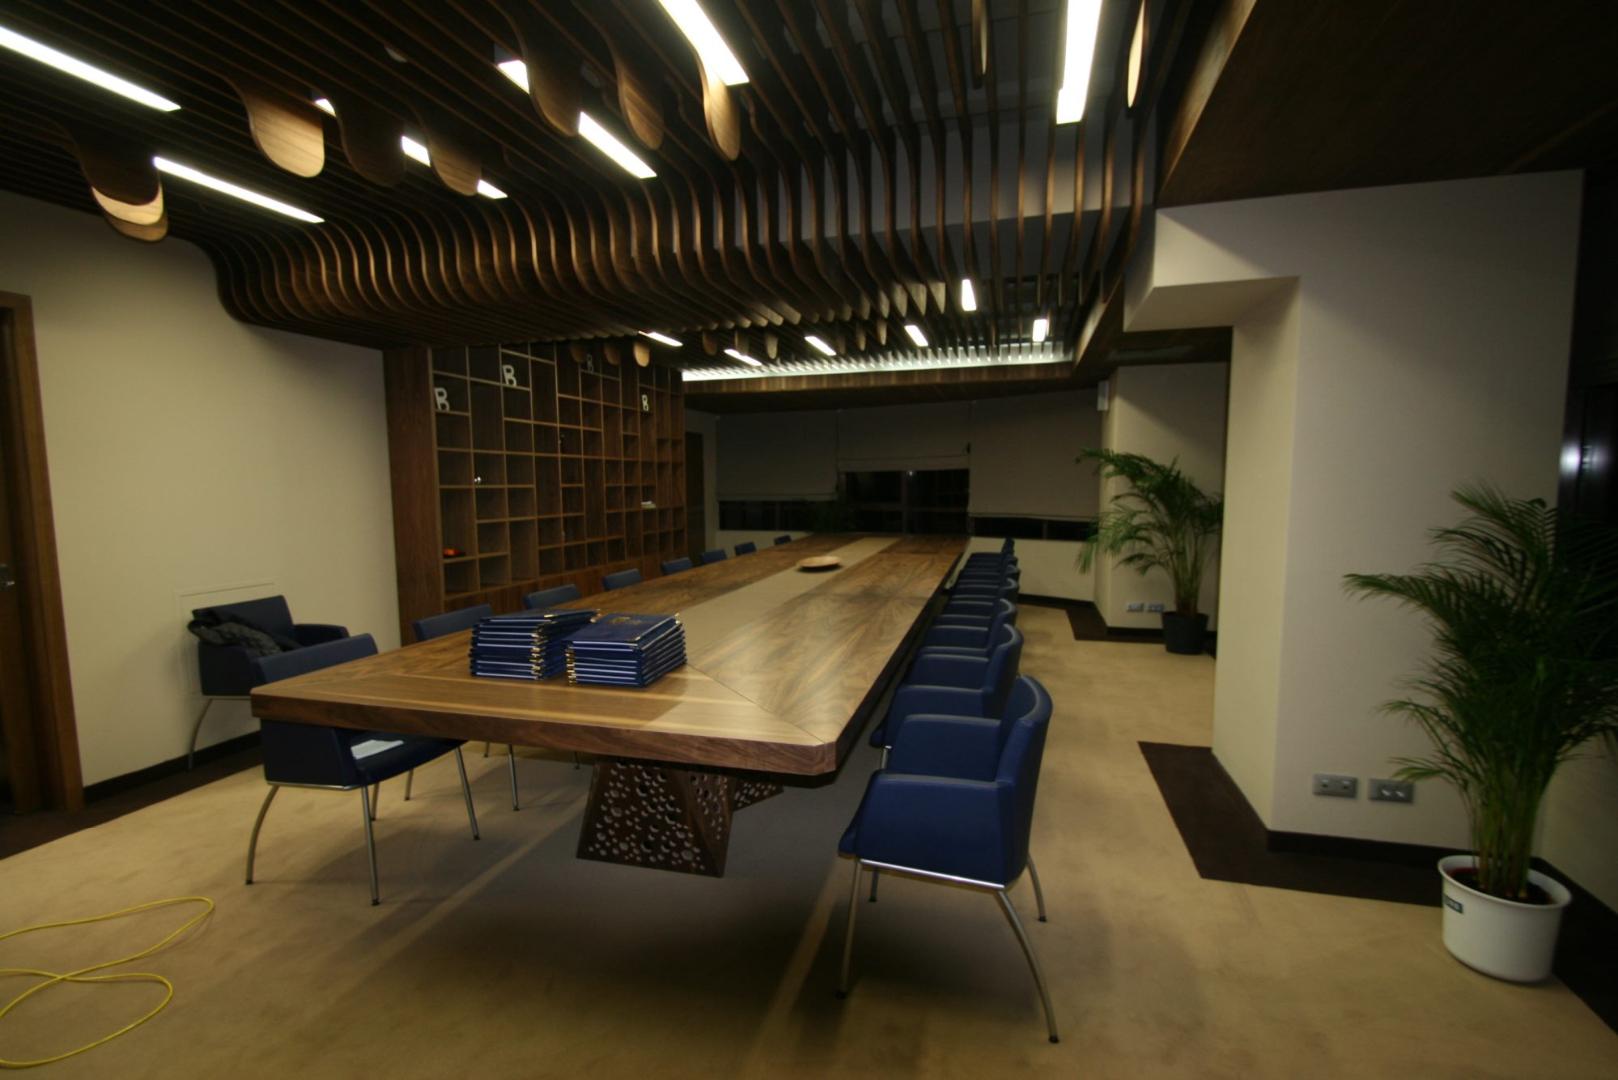 placari pereti corian iluminat led receptie corian termoformat furnir tavan furnir nuc tridimensional mobilier trafoare atipic depa015